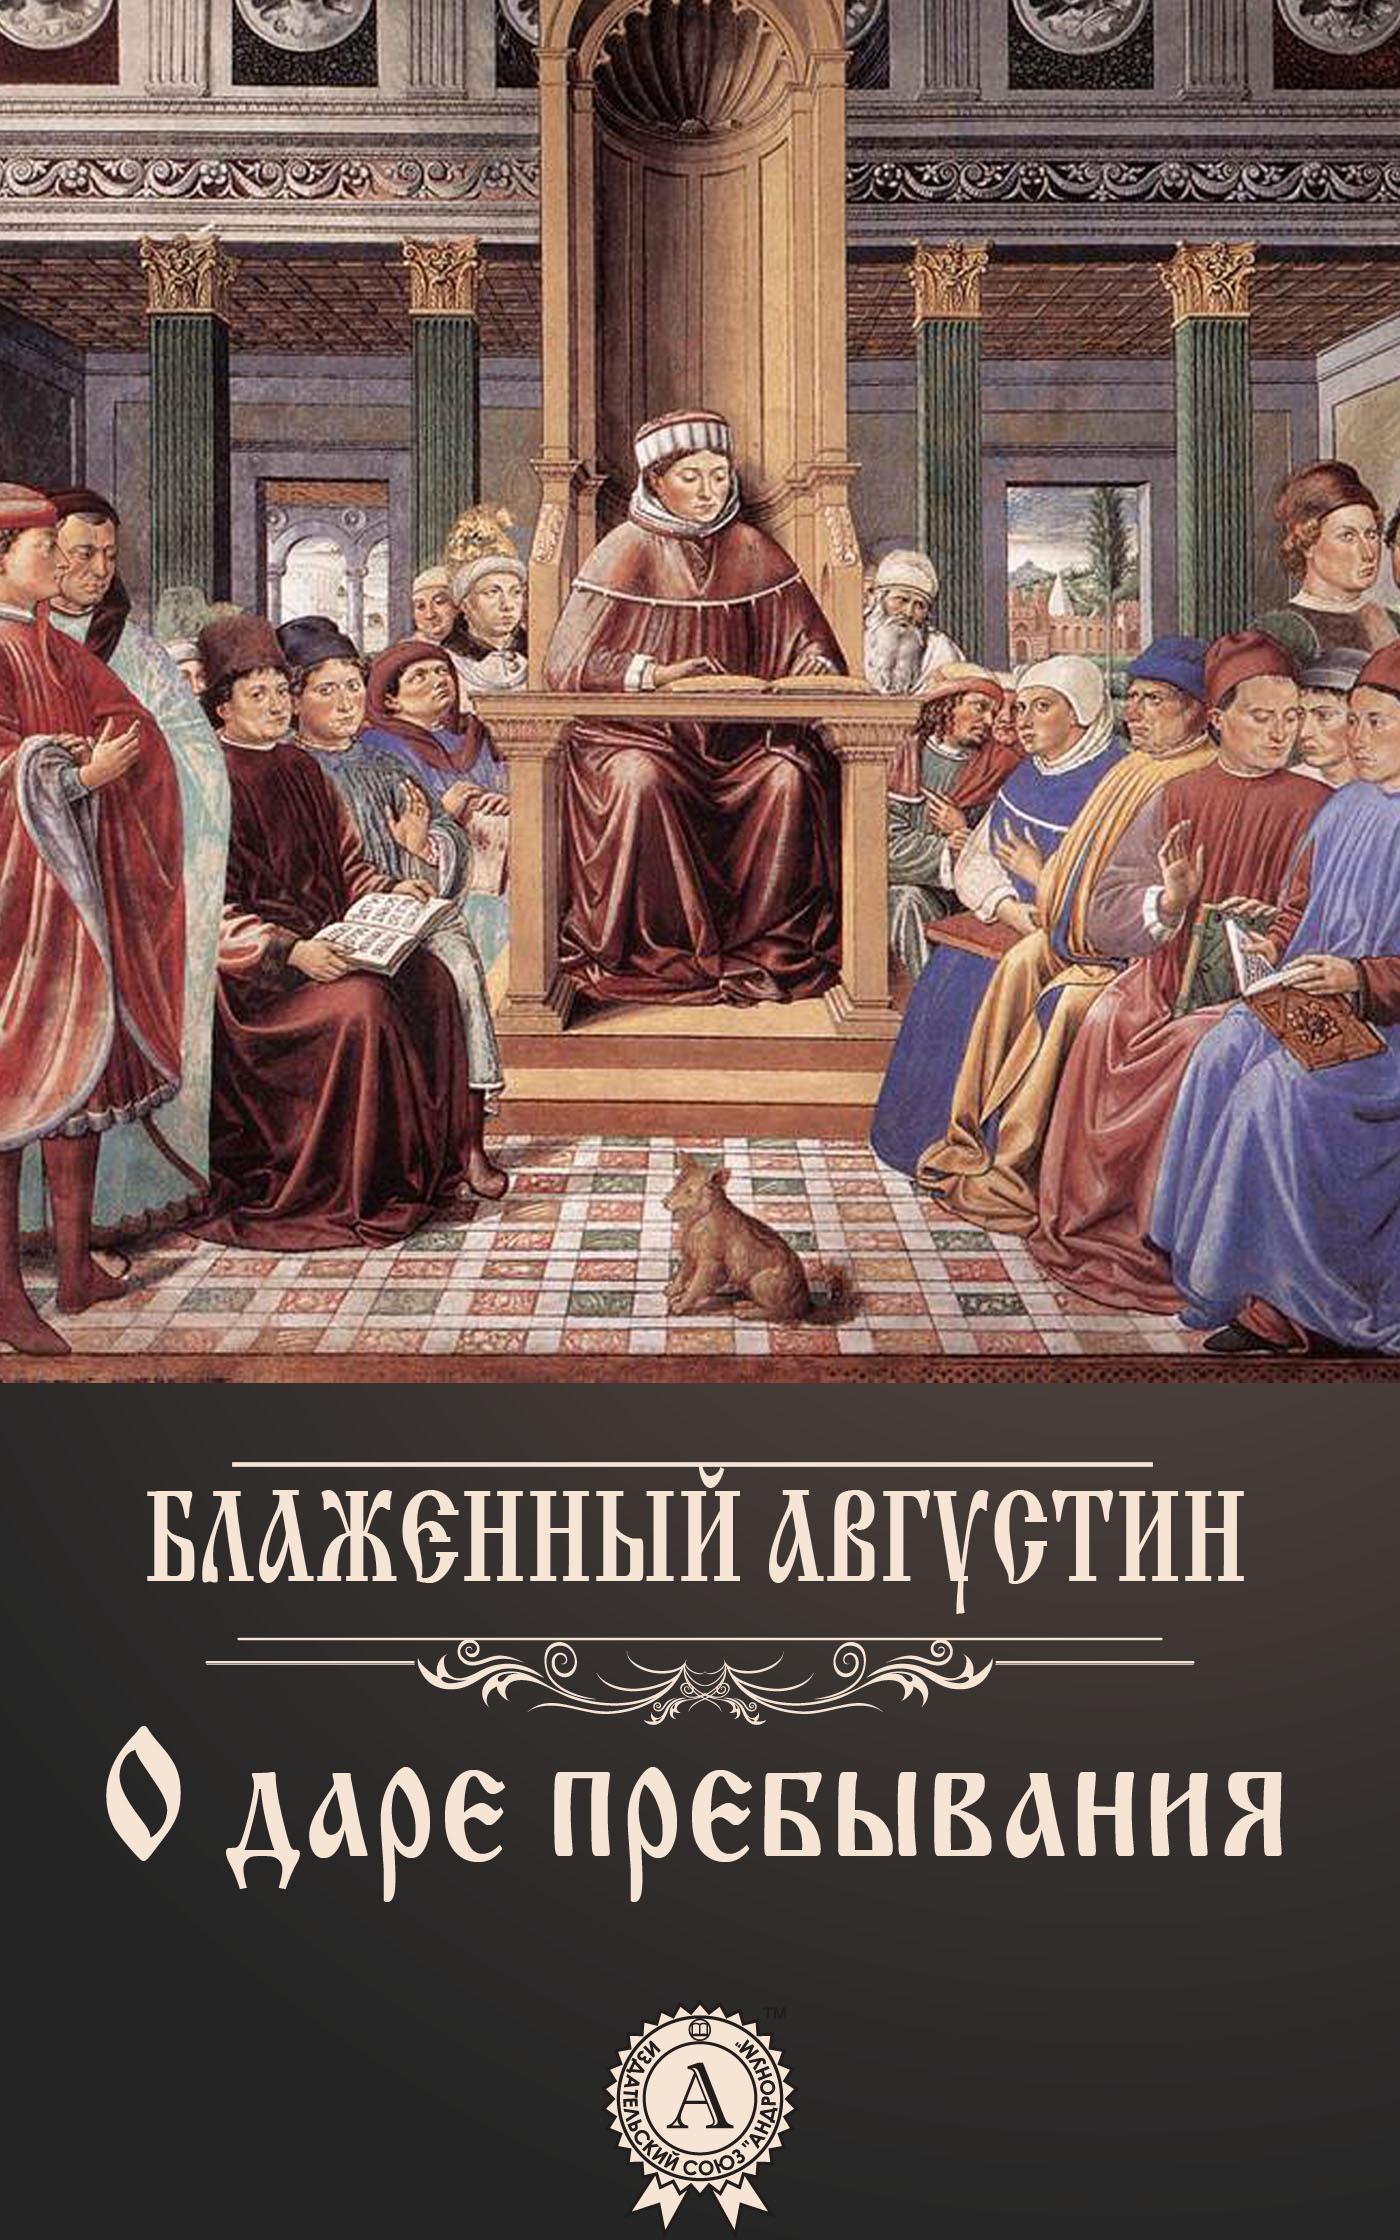 Аврелій Блаженний Августин О даре пребывания